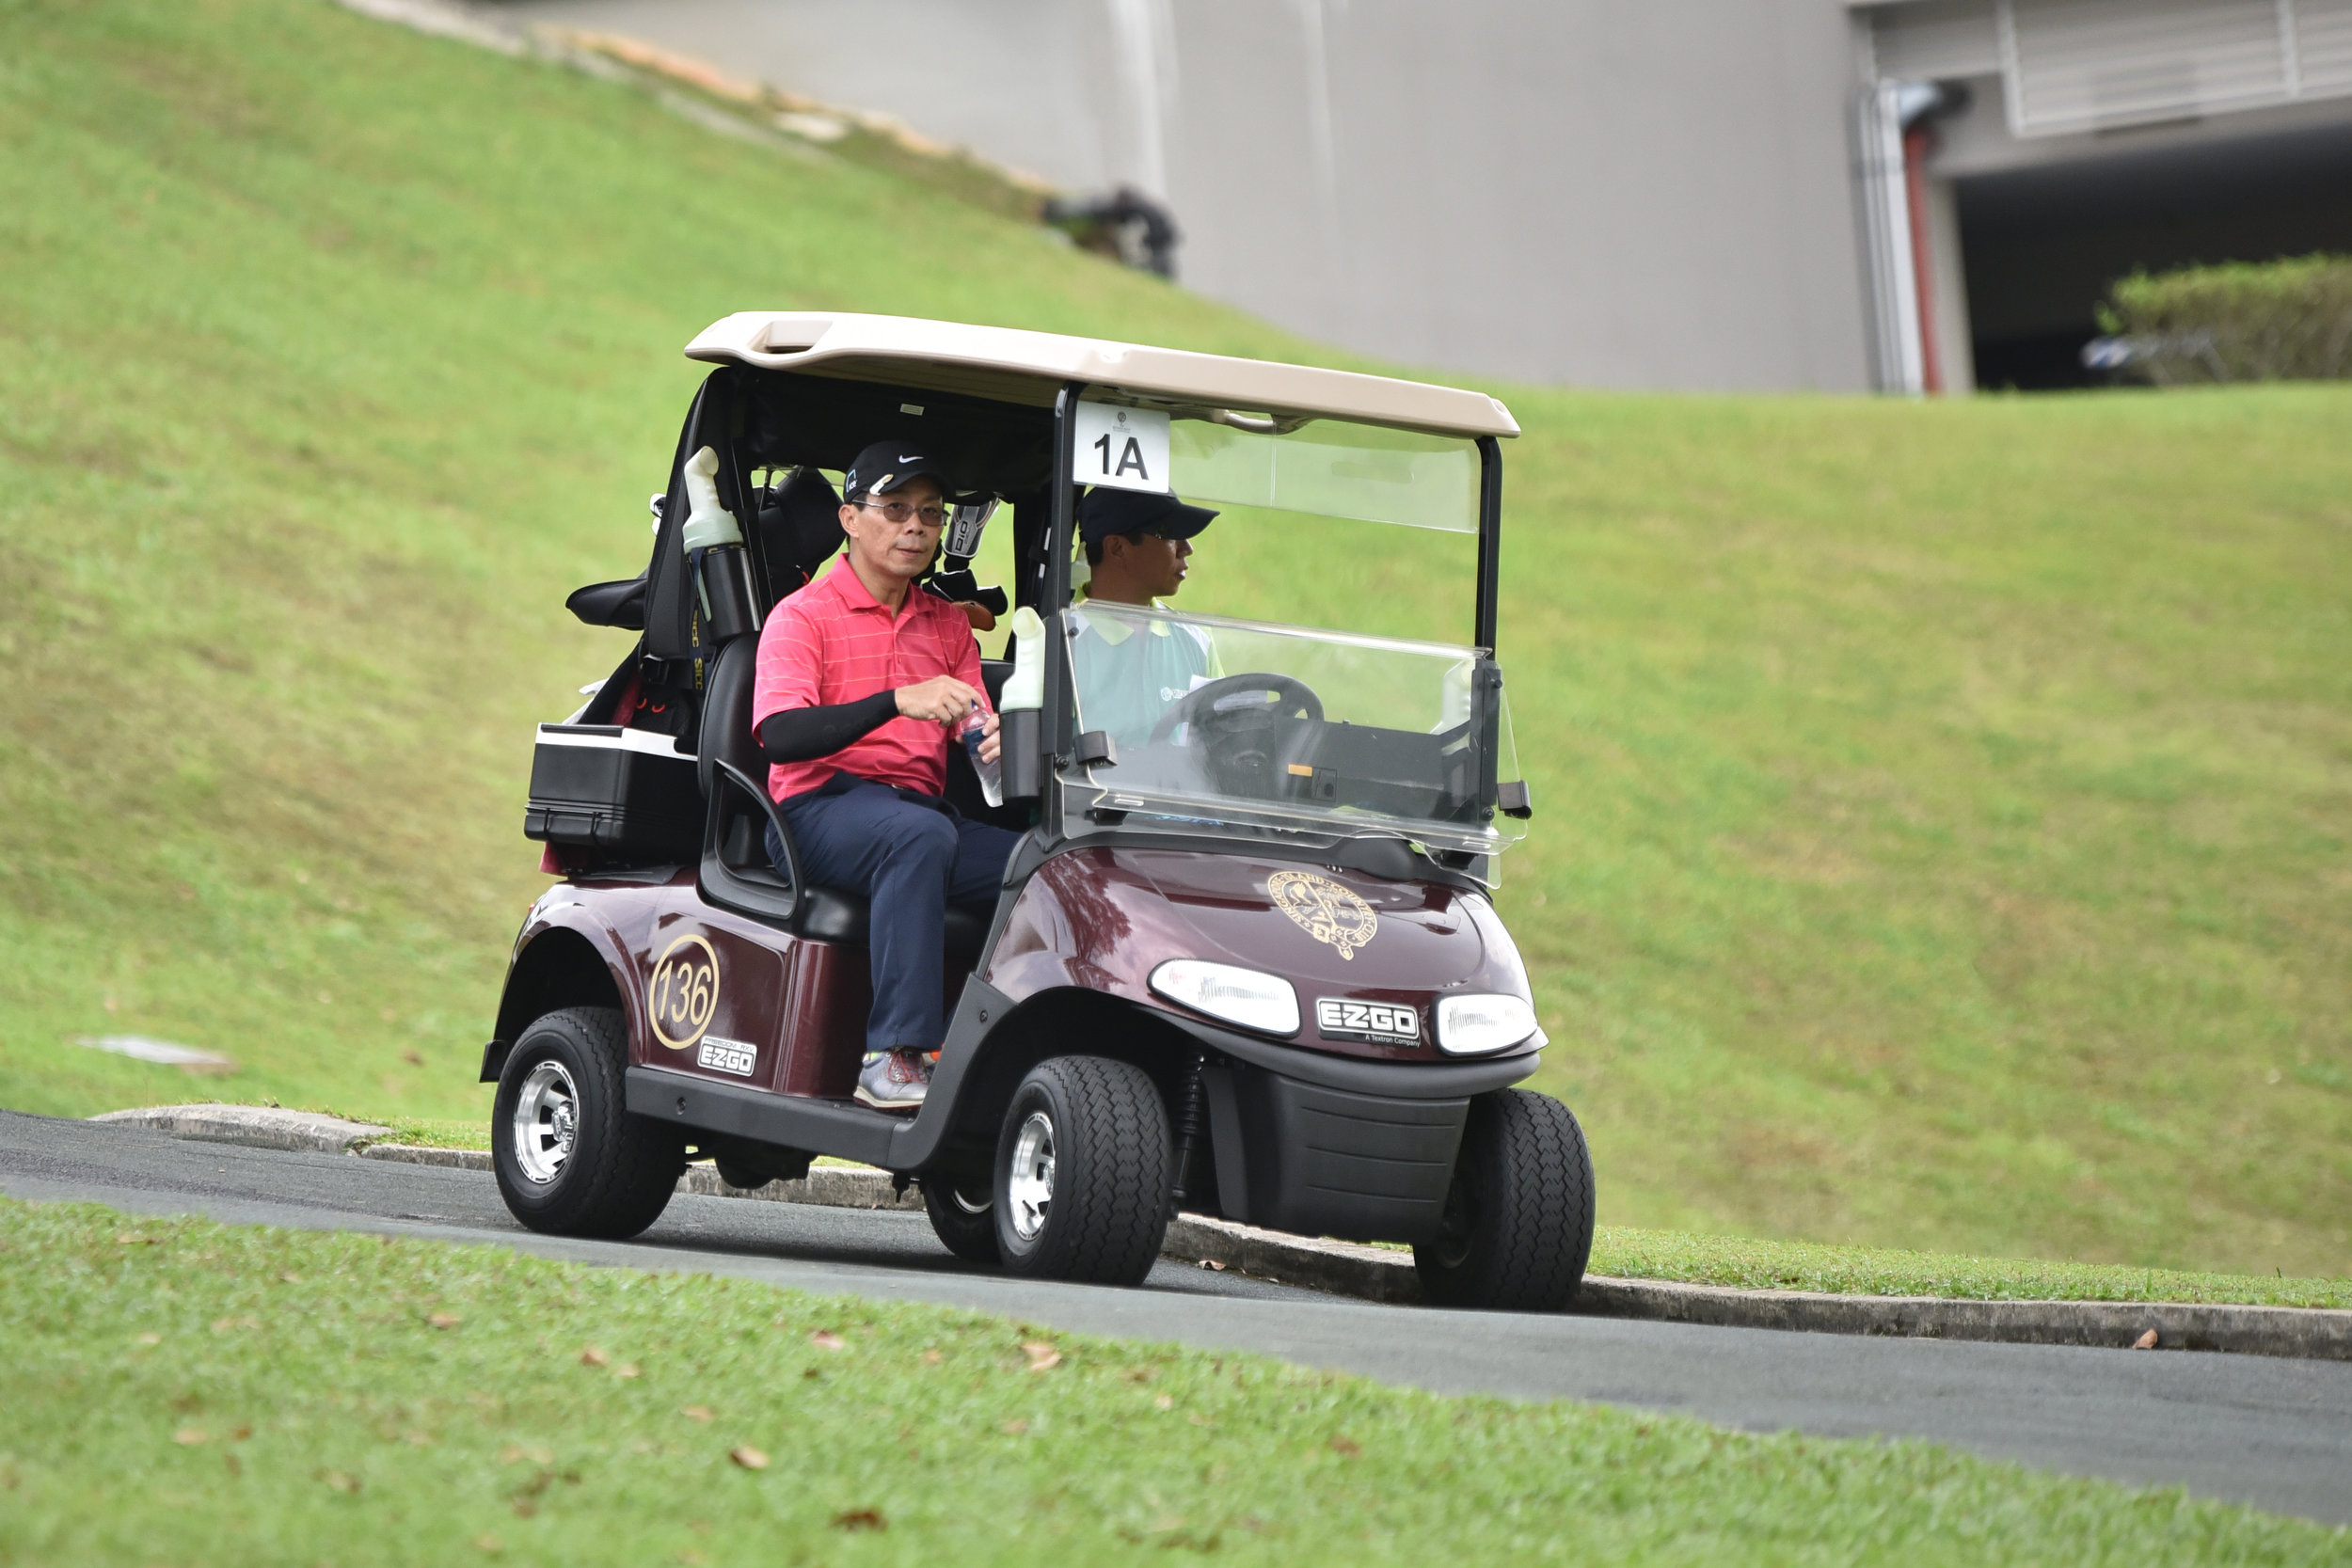 TC-golf0140.JPG